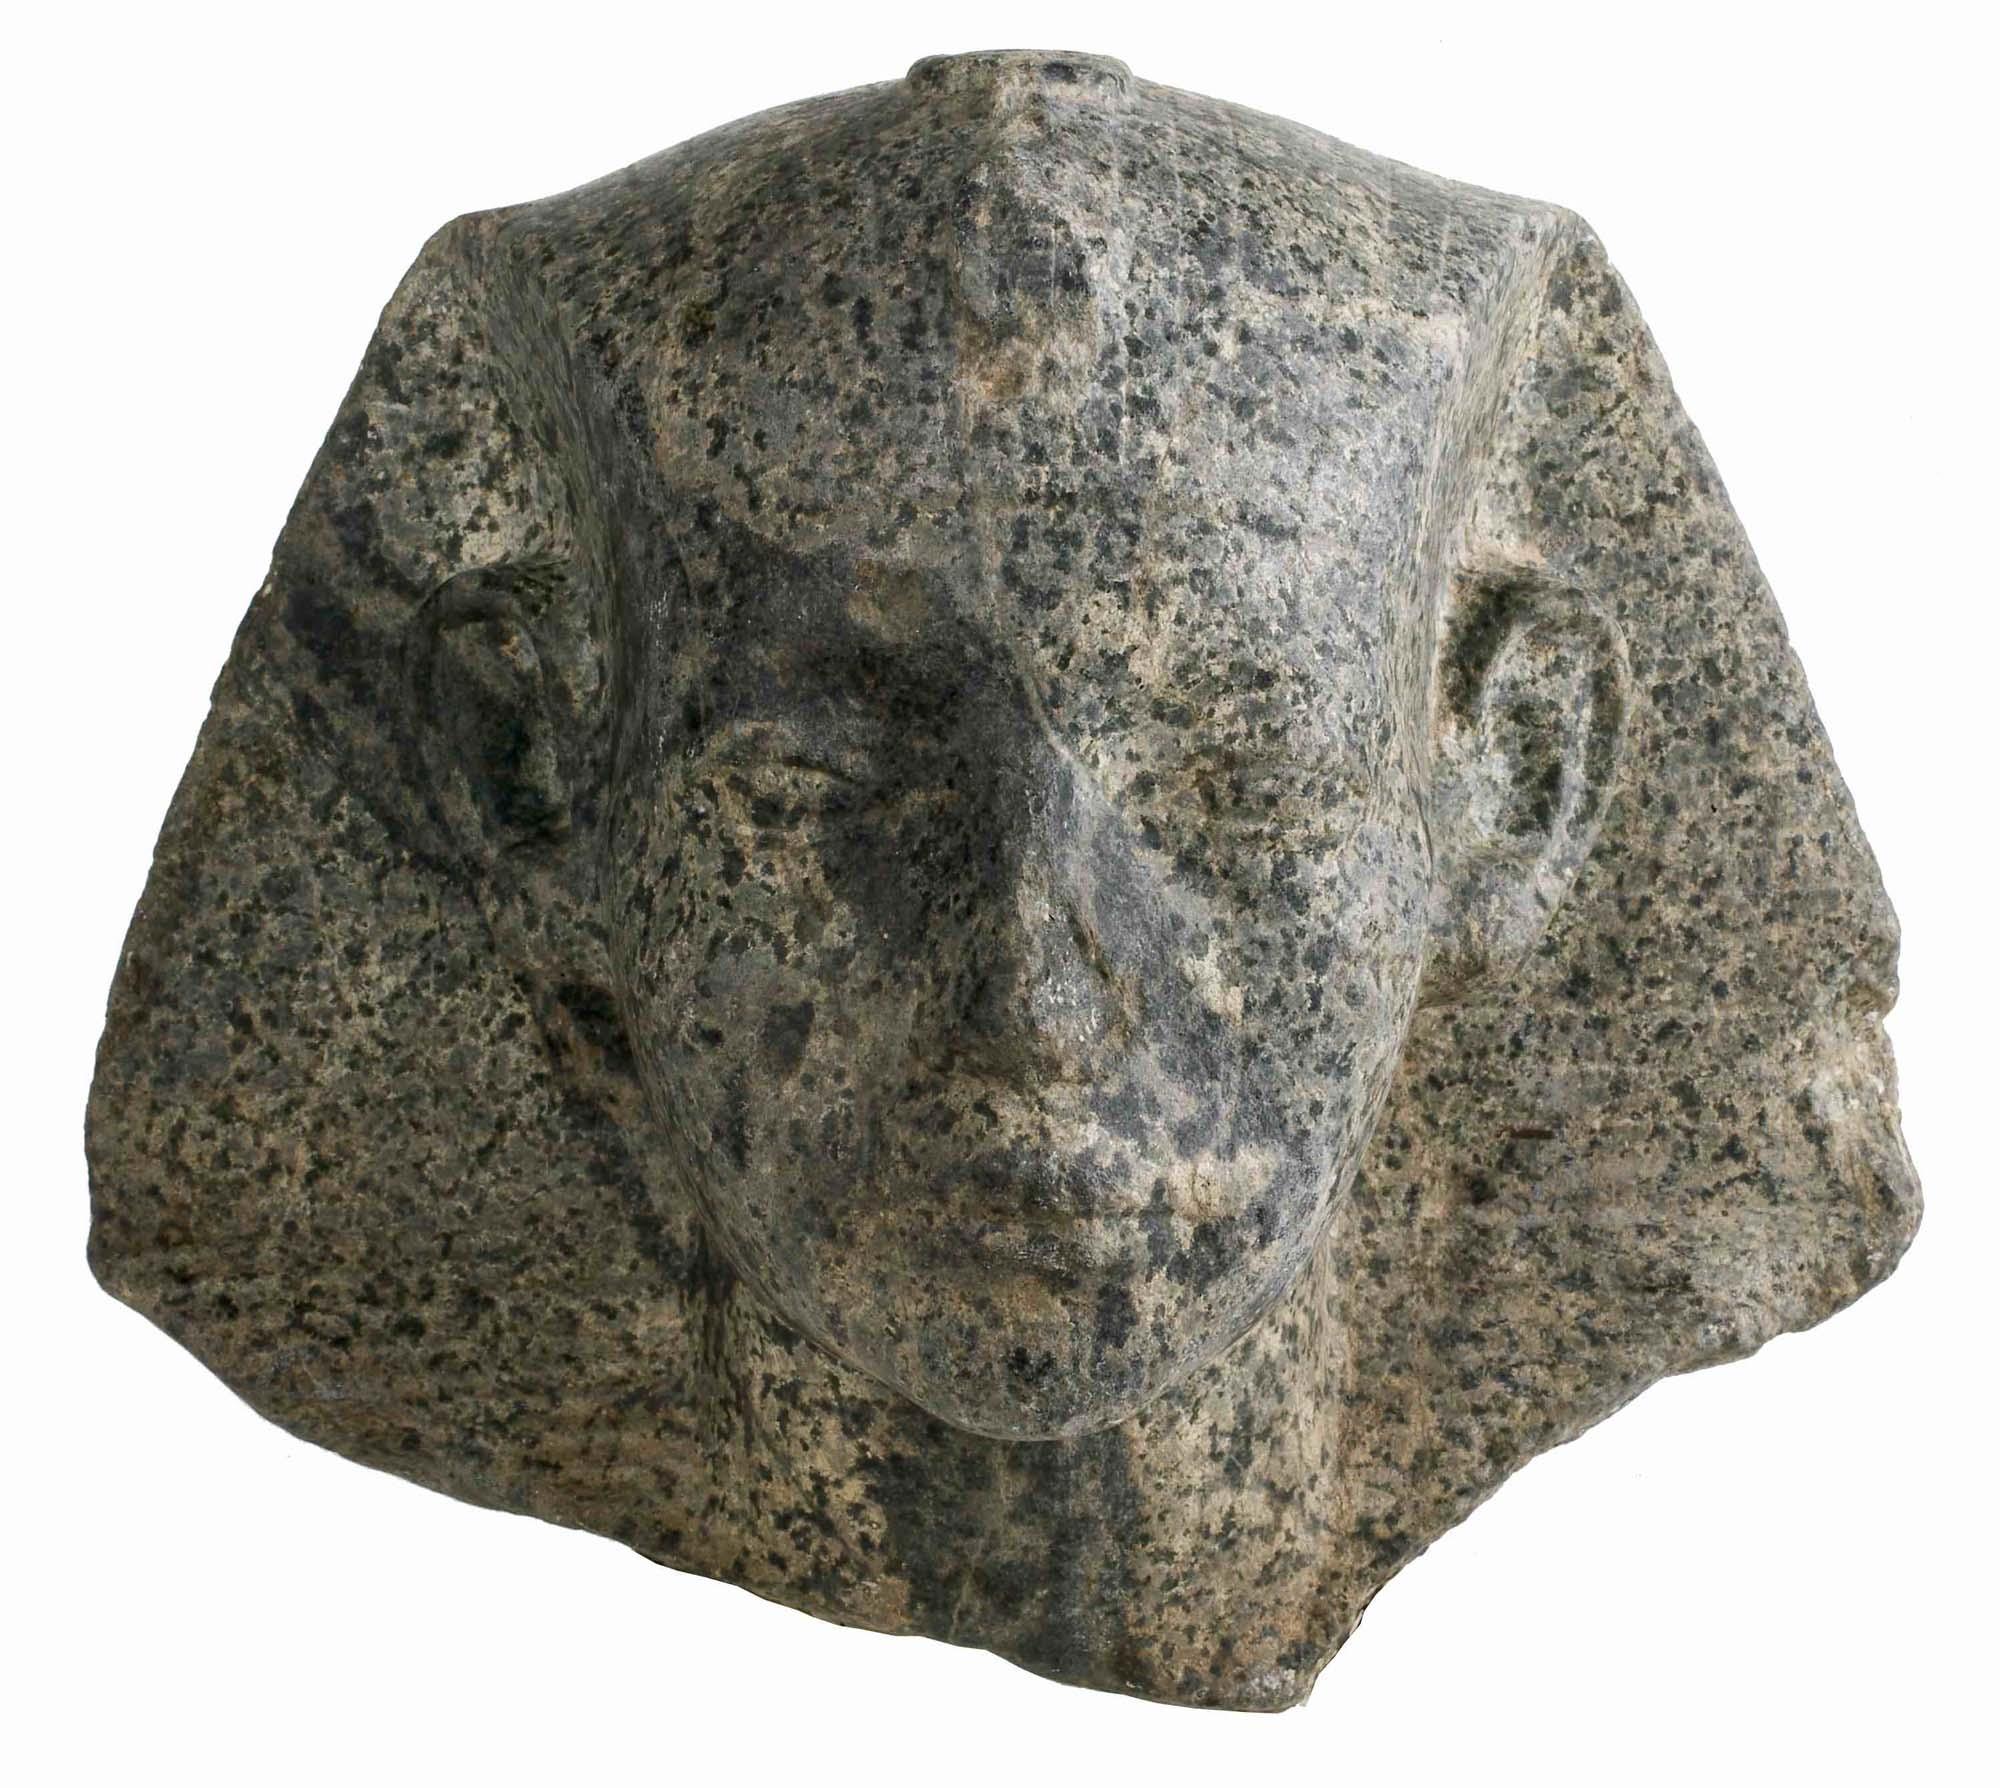 photo of a carved head of an Egyptian Pharoah